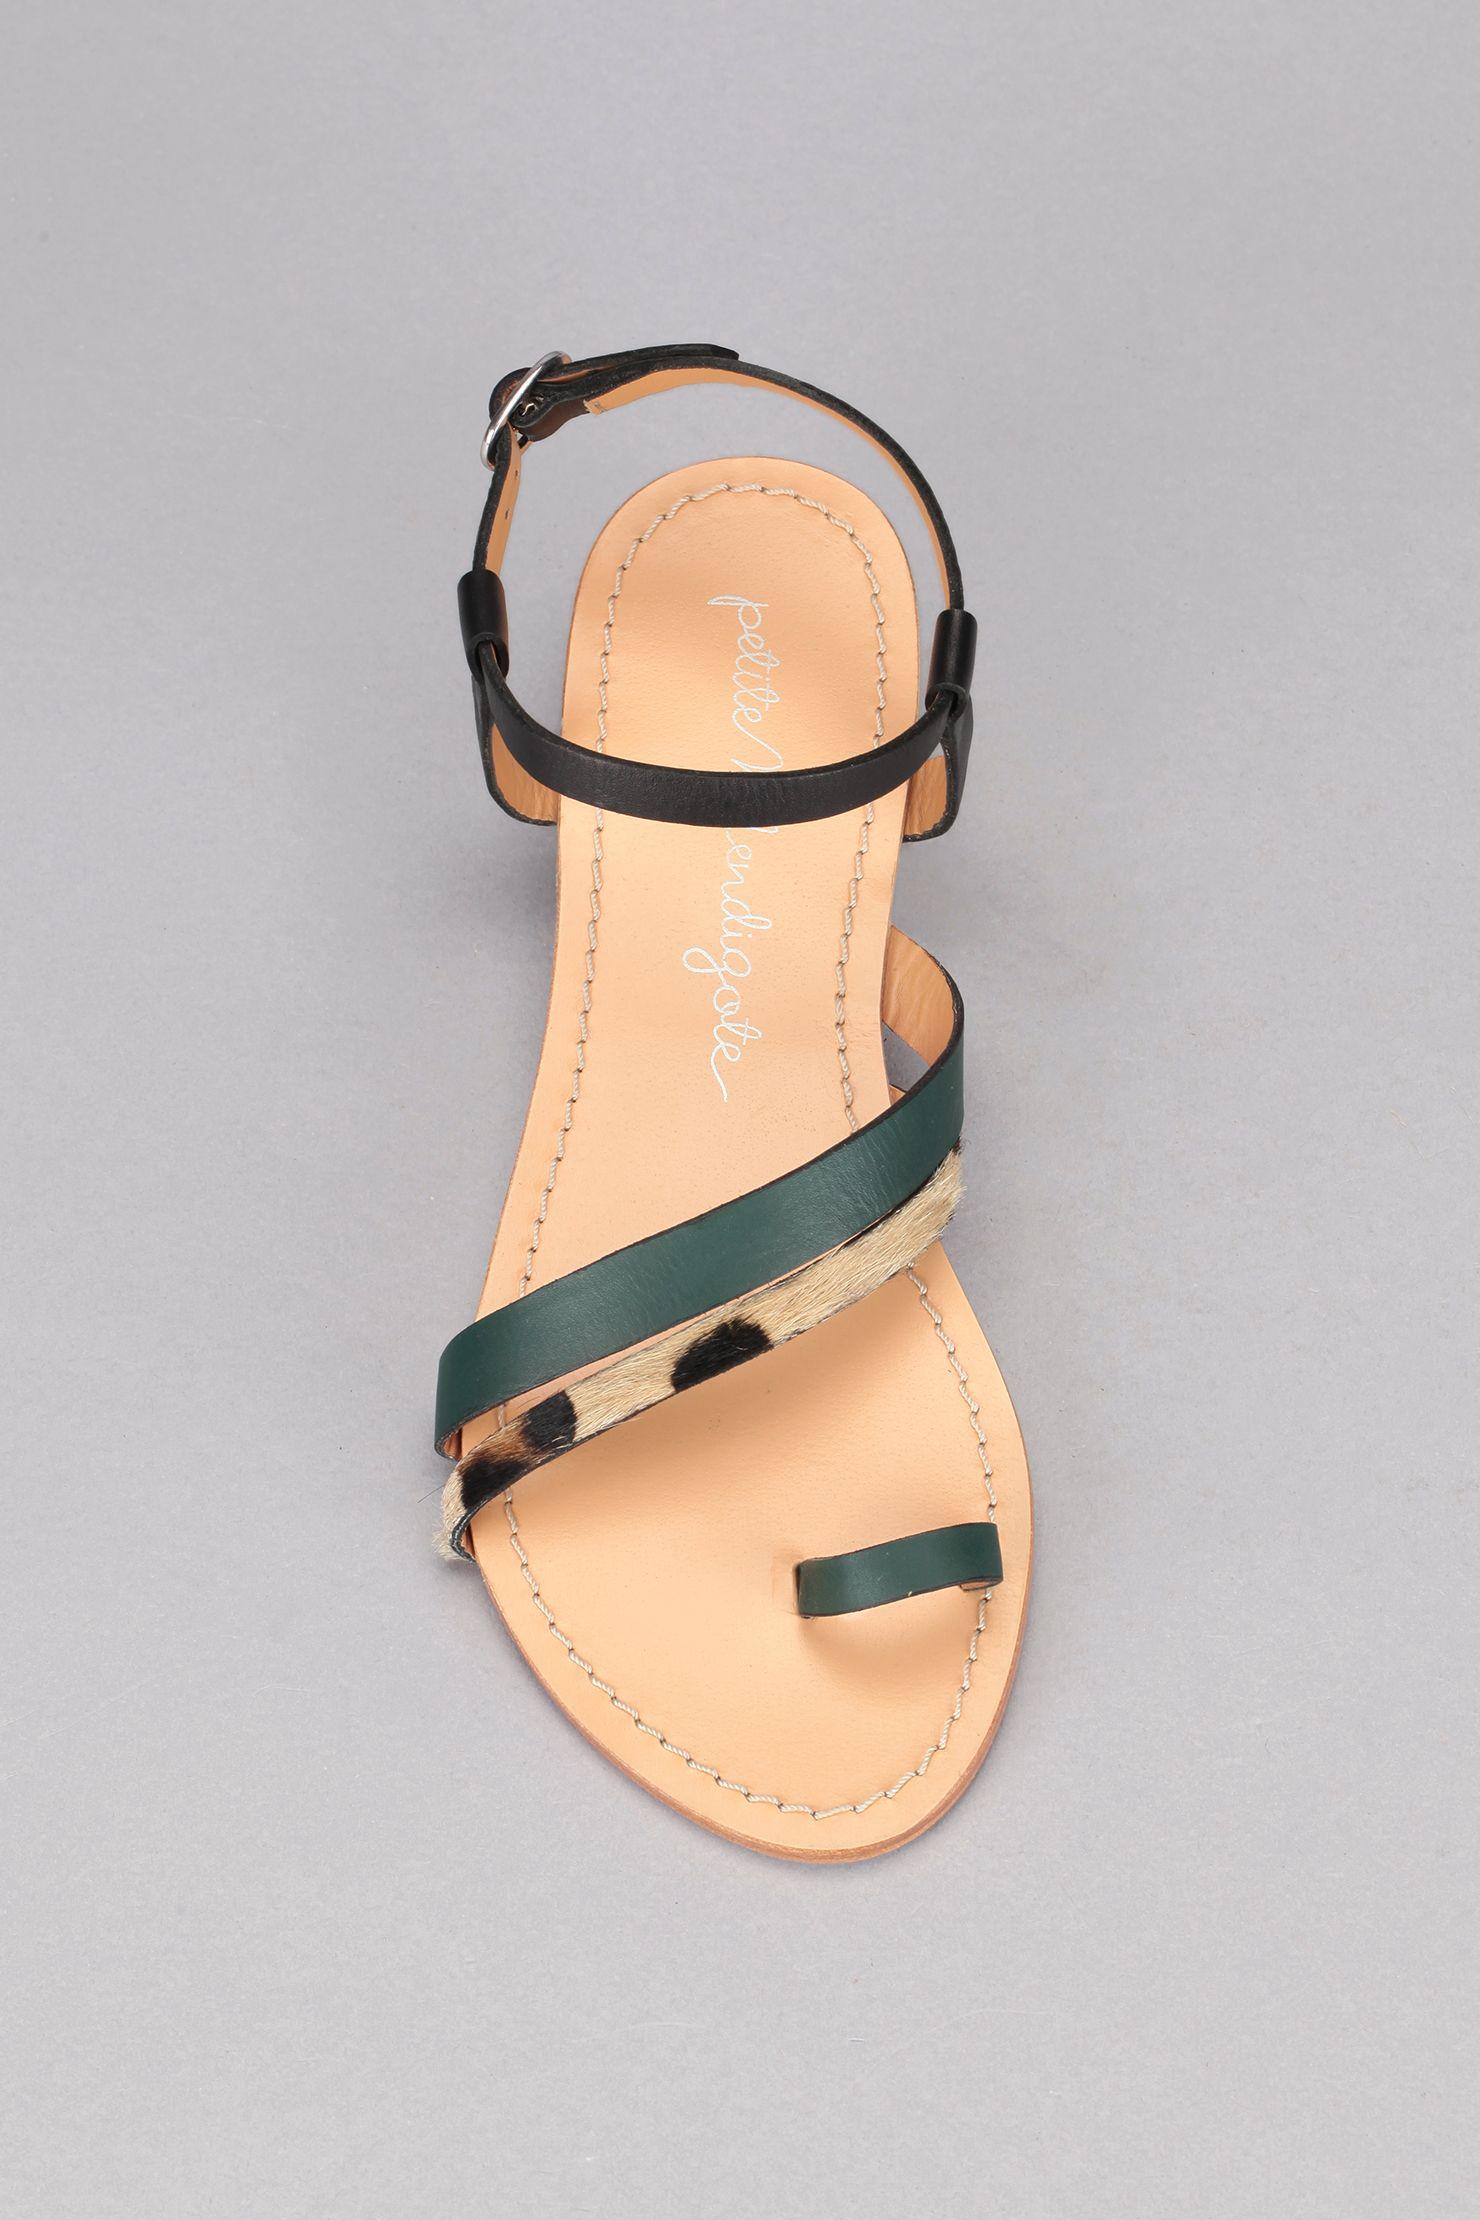 63fcb2dd13b4 Nu-pieds cuir crin de poulain Formentera Slow Fashion